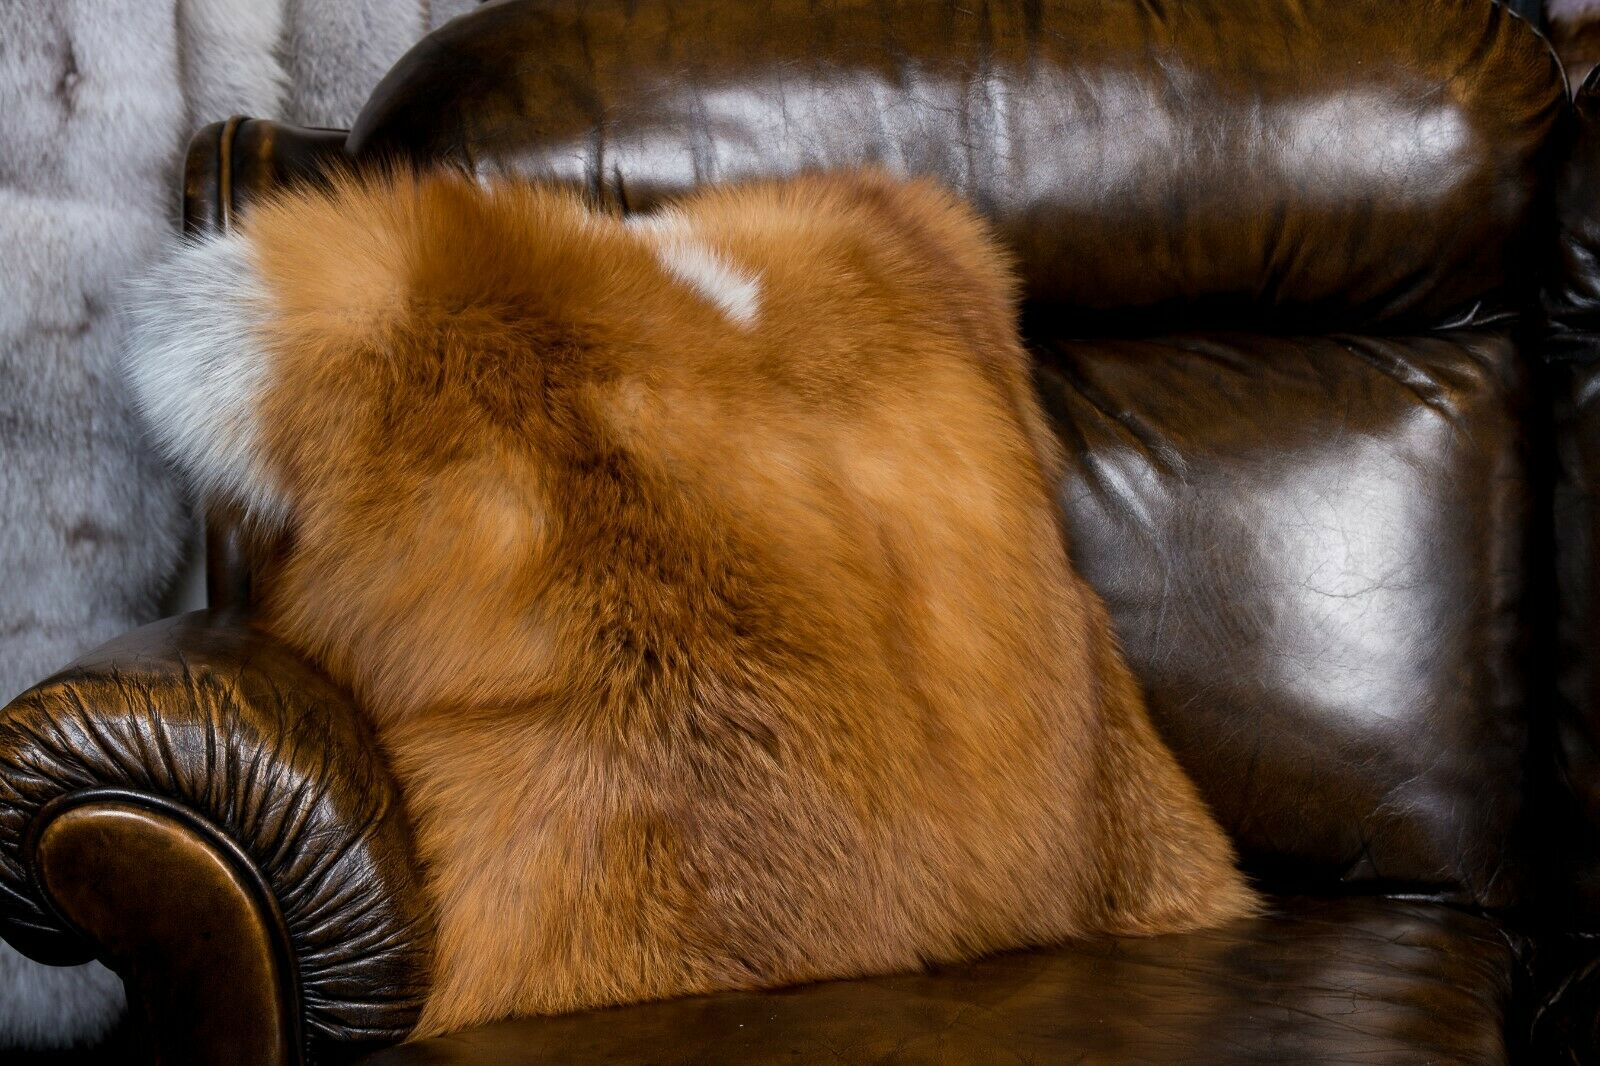 382 Rotfuchskissen aus kanadischen Füchsen - doppelseitiges Fell - Echtfell Fell